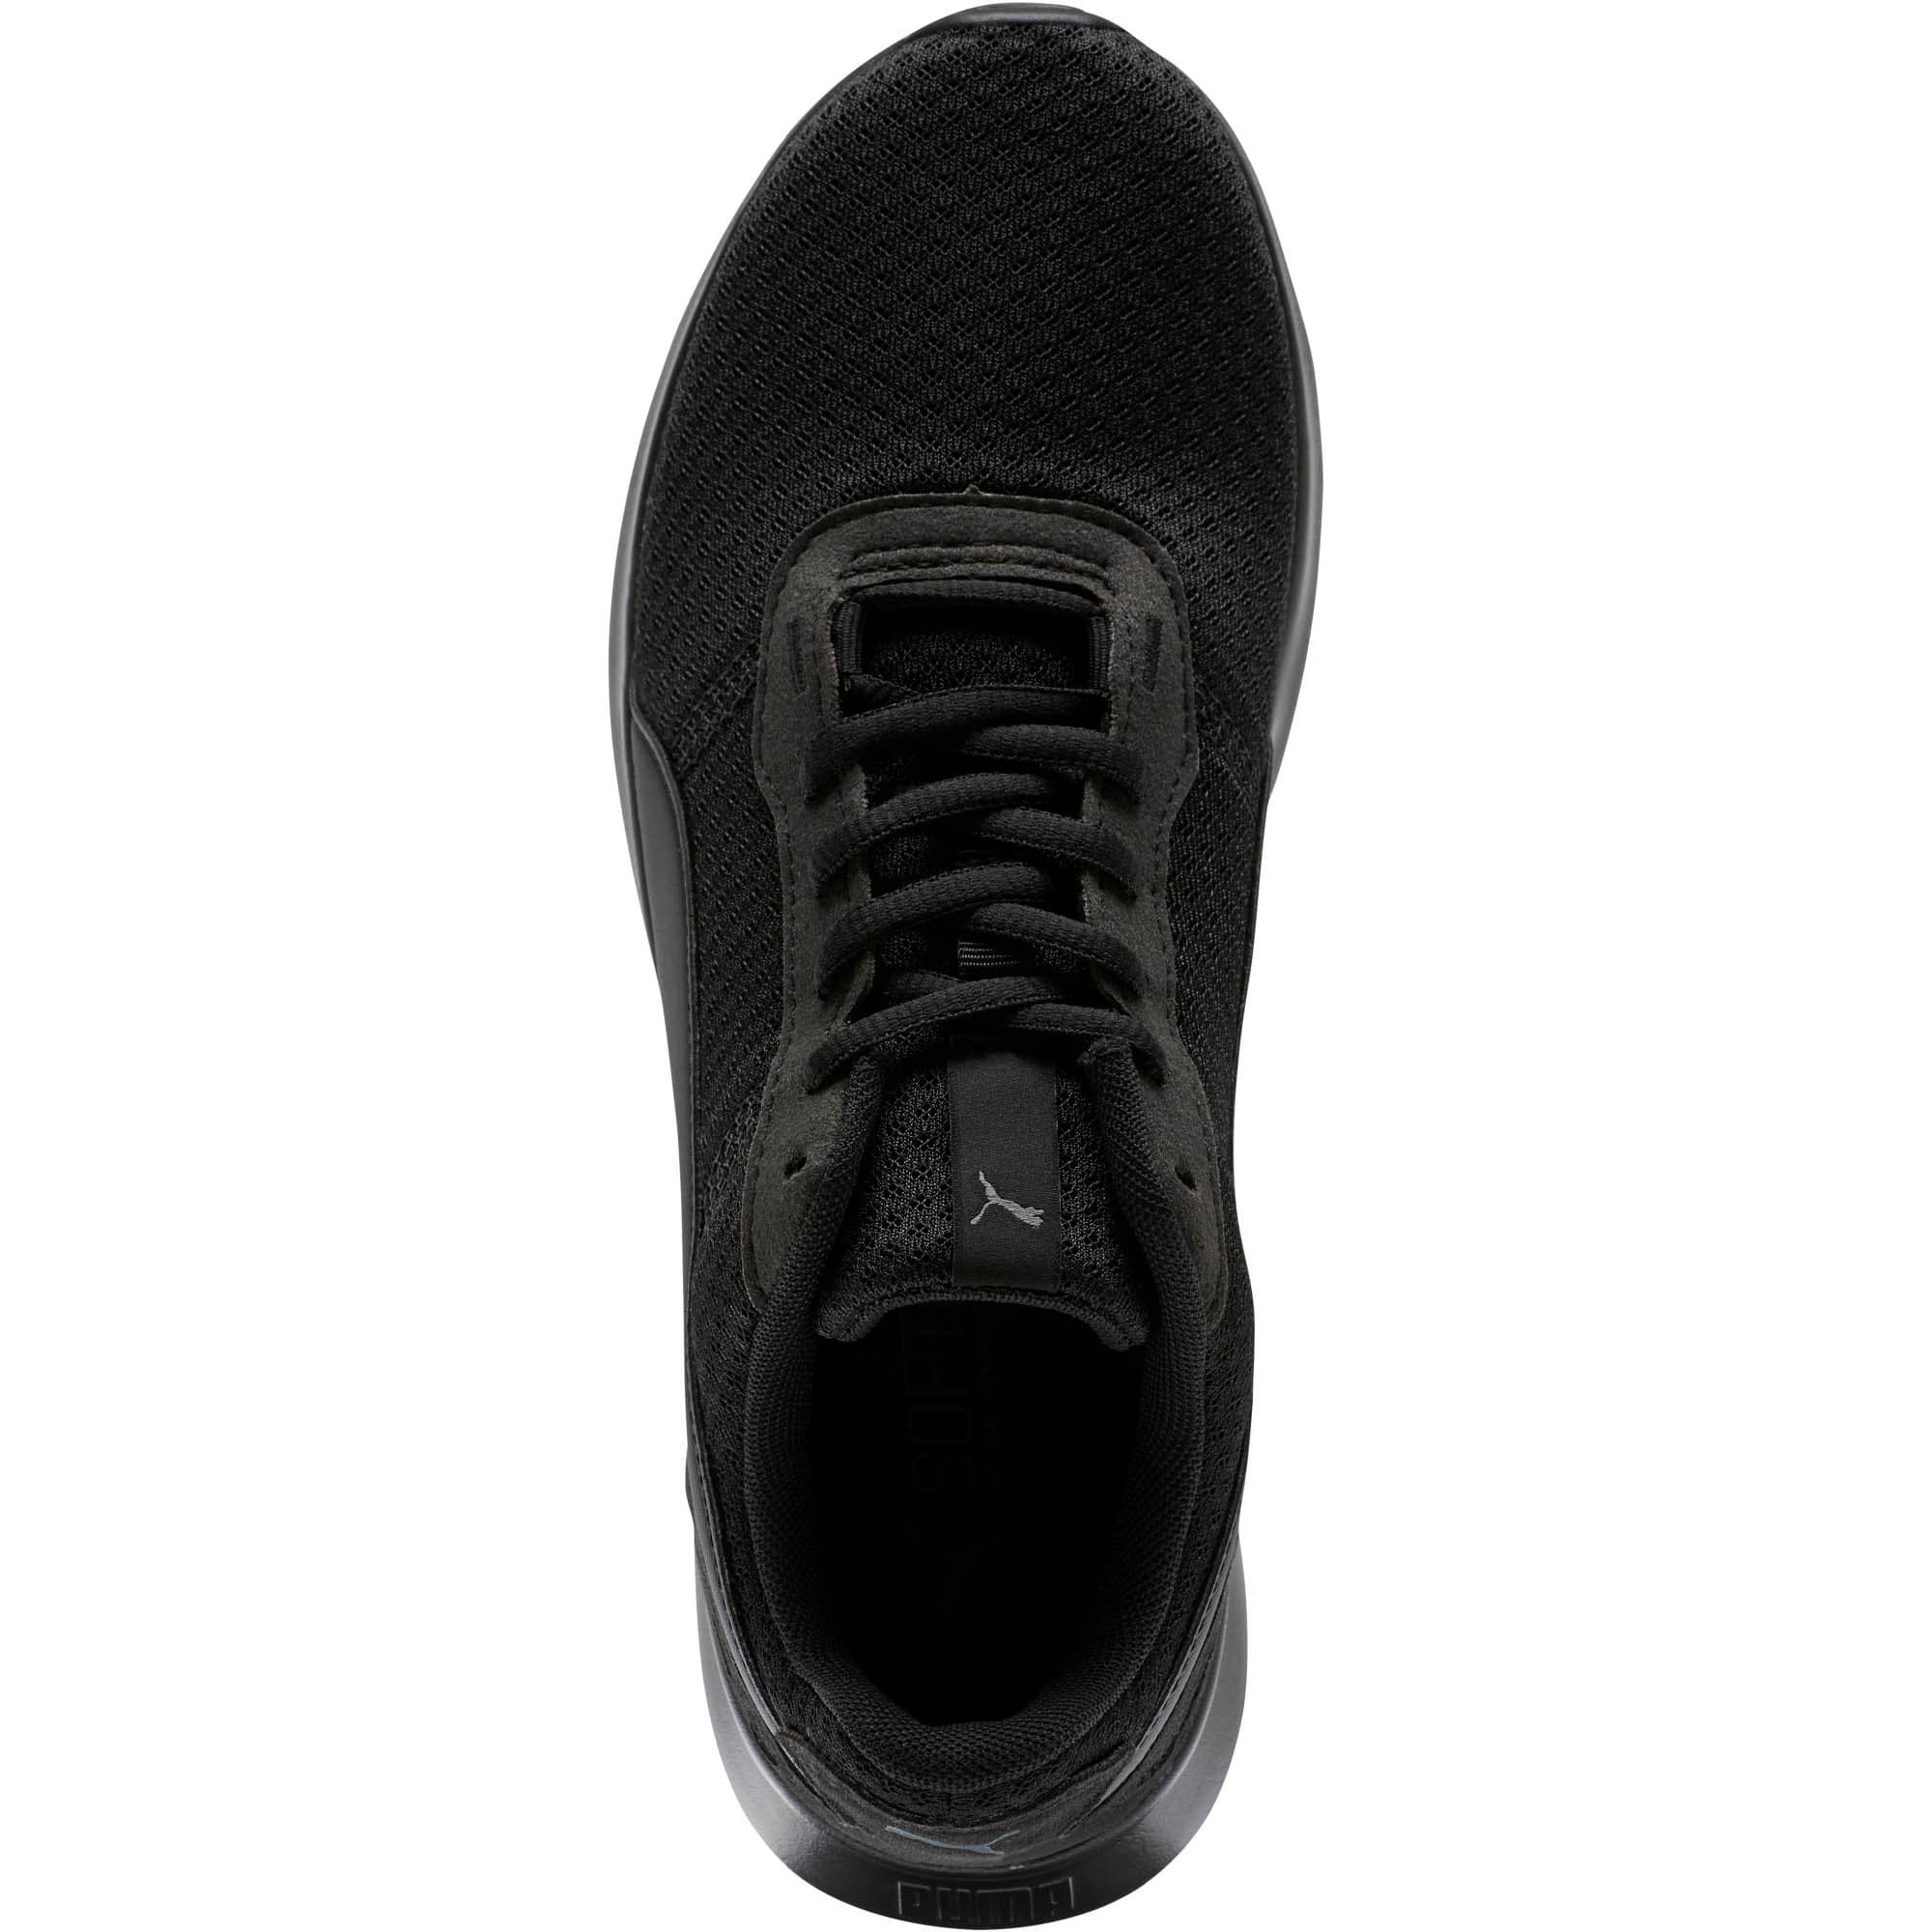 Thumbnail 5 of ST Activate Women's Sneakers, Puma Black-Puma Black, medium